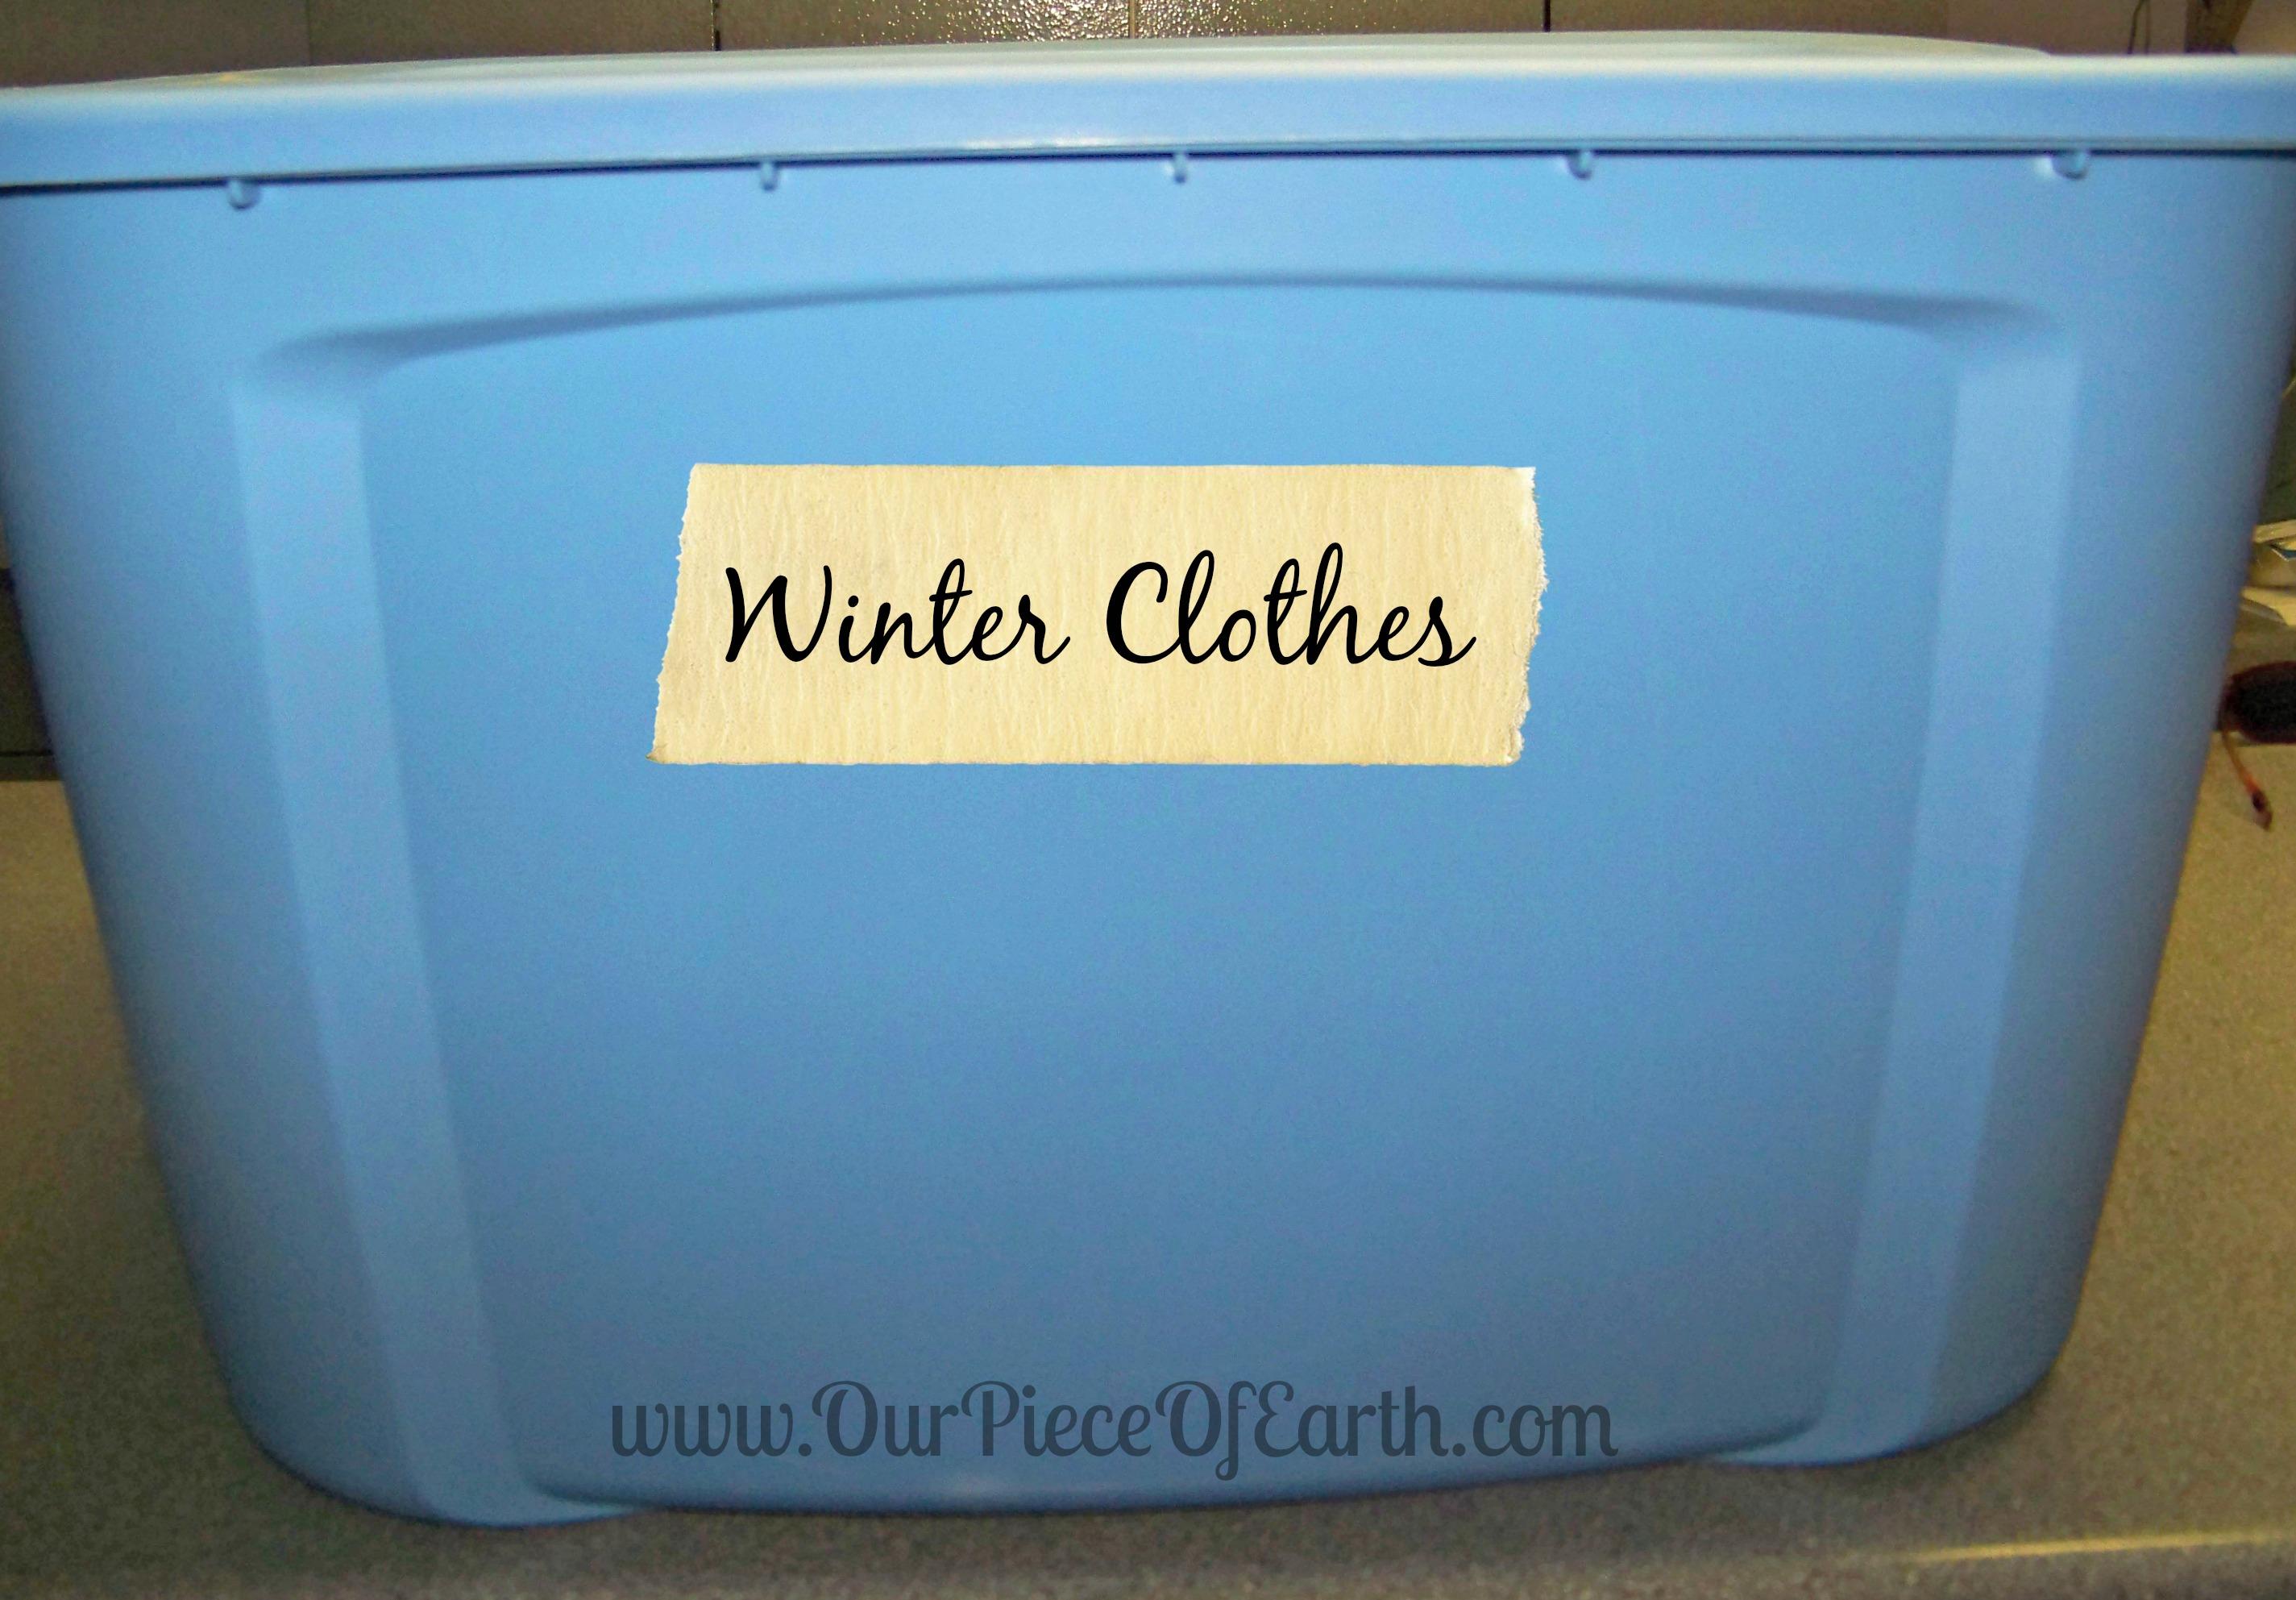 4 Simple Tips to De-Clutter Your Closet